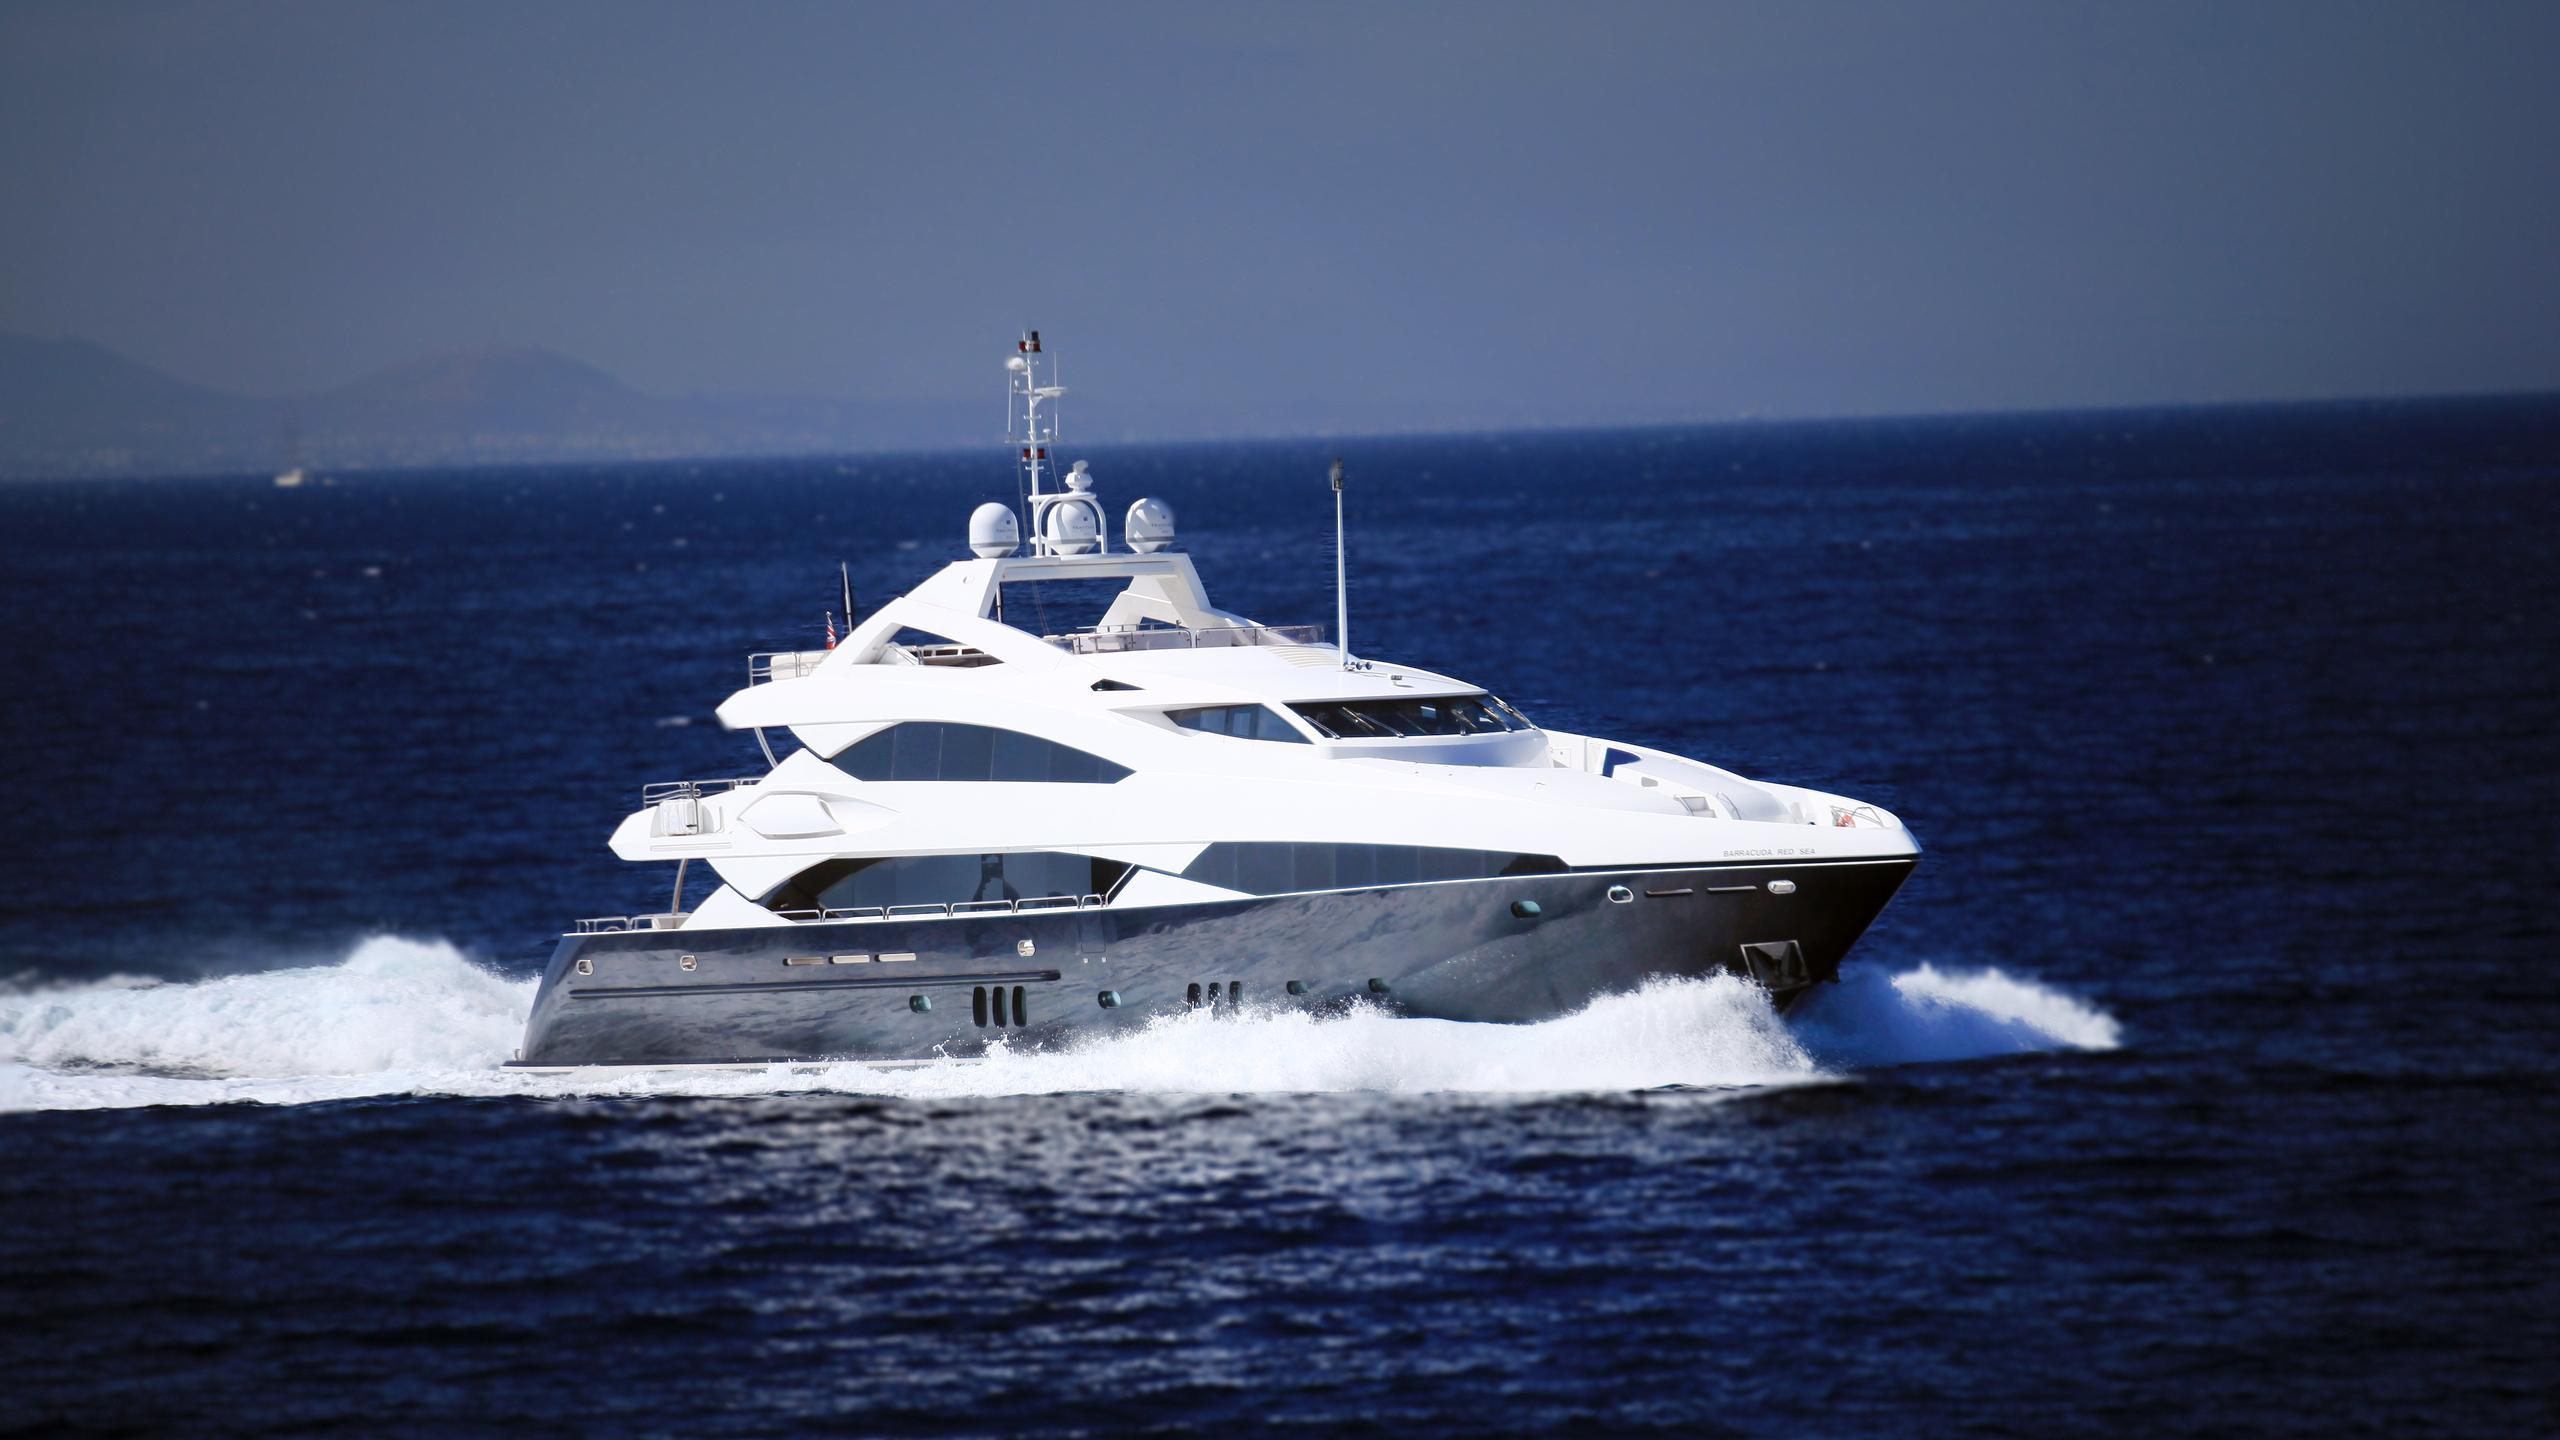 barracuda-red-sea-yacht-at-sea